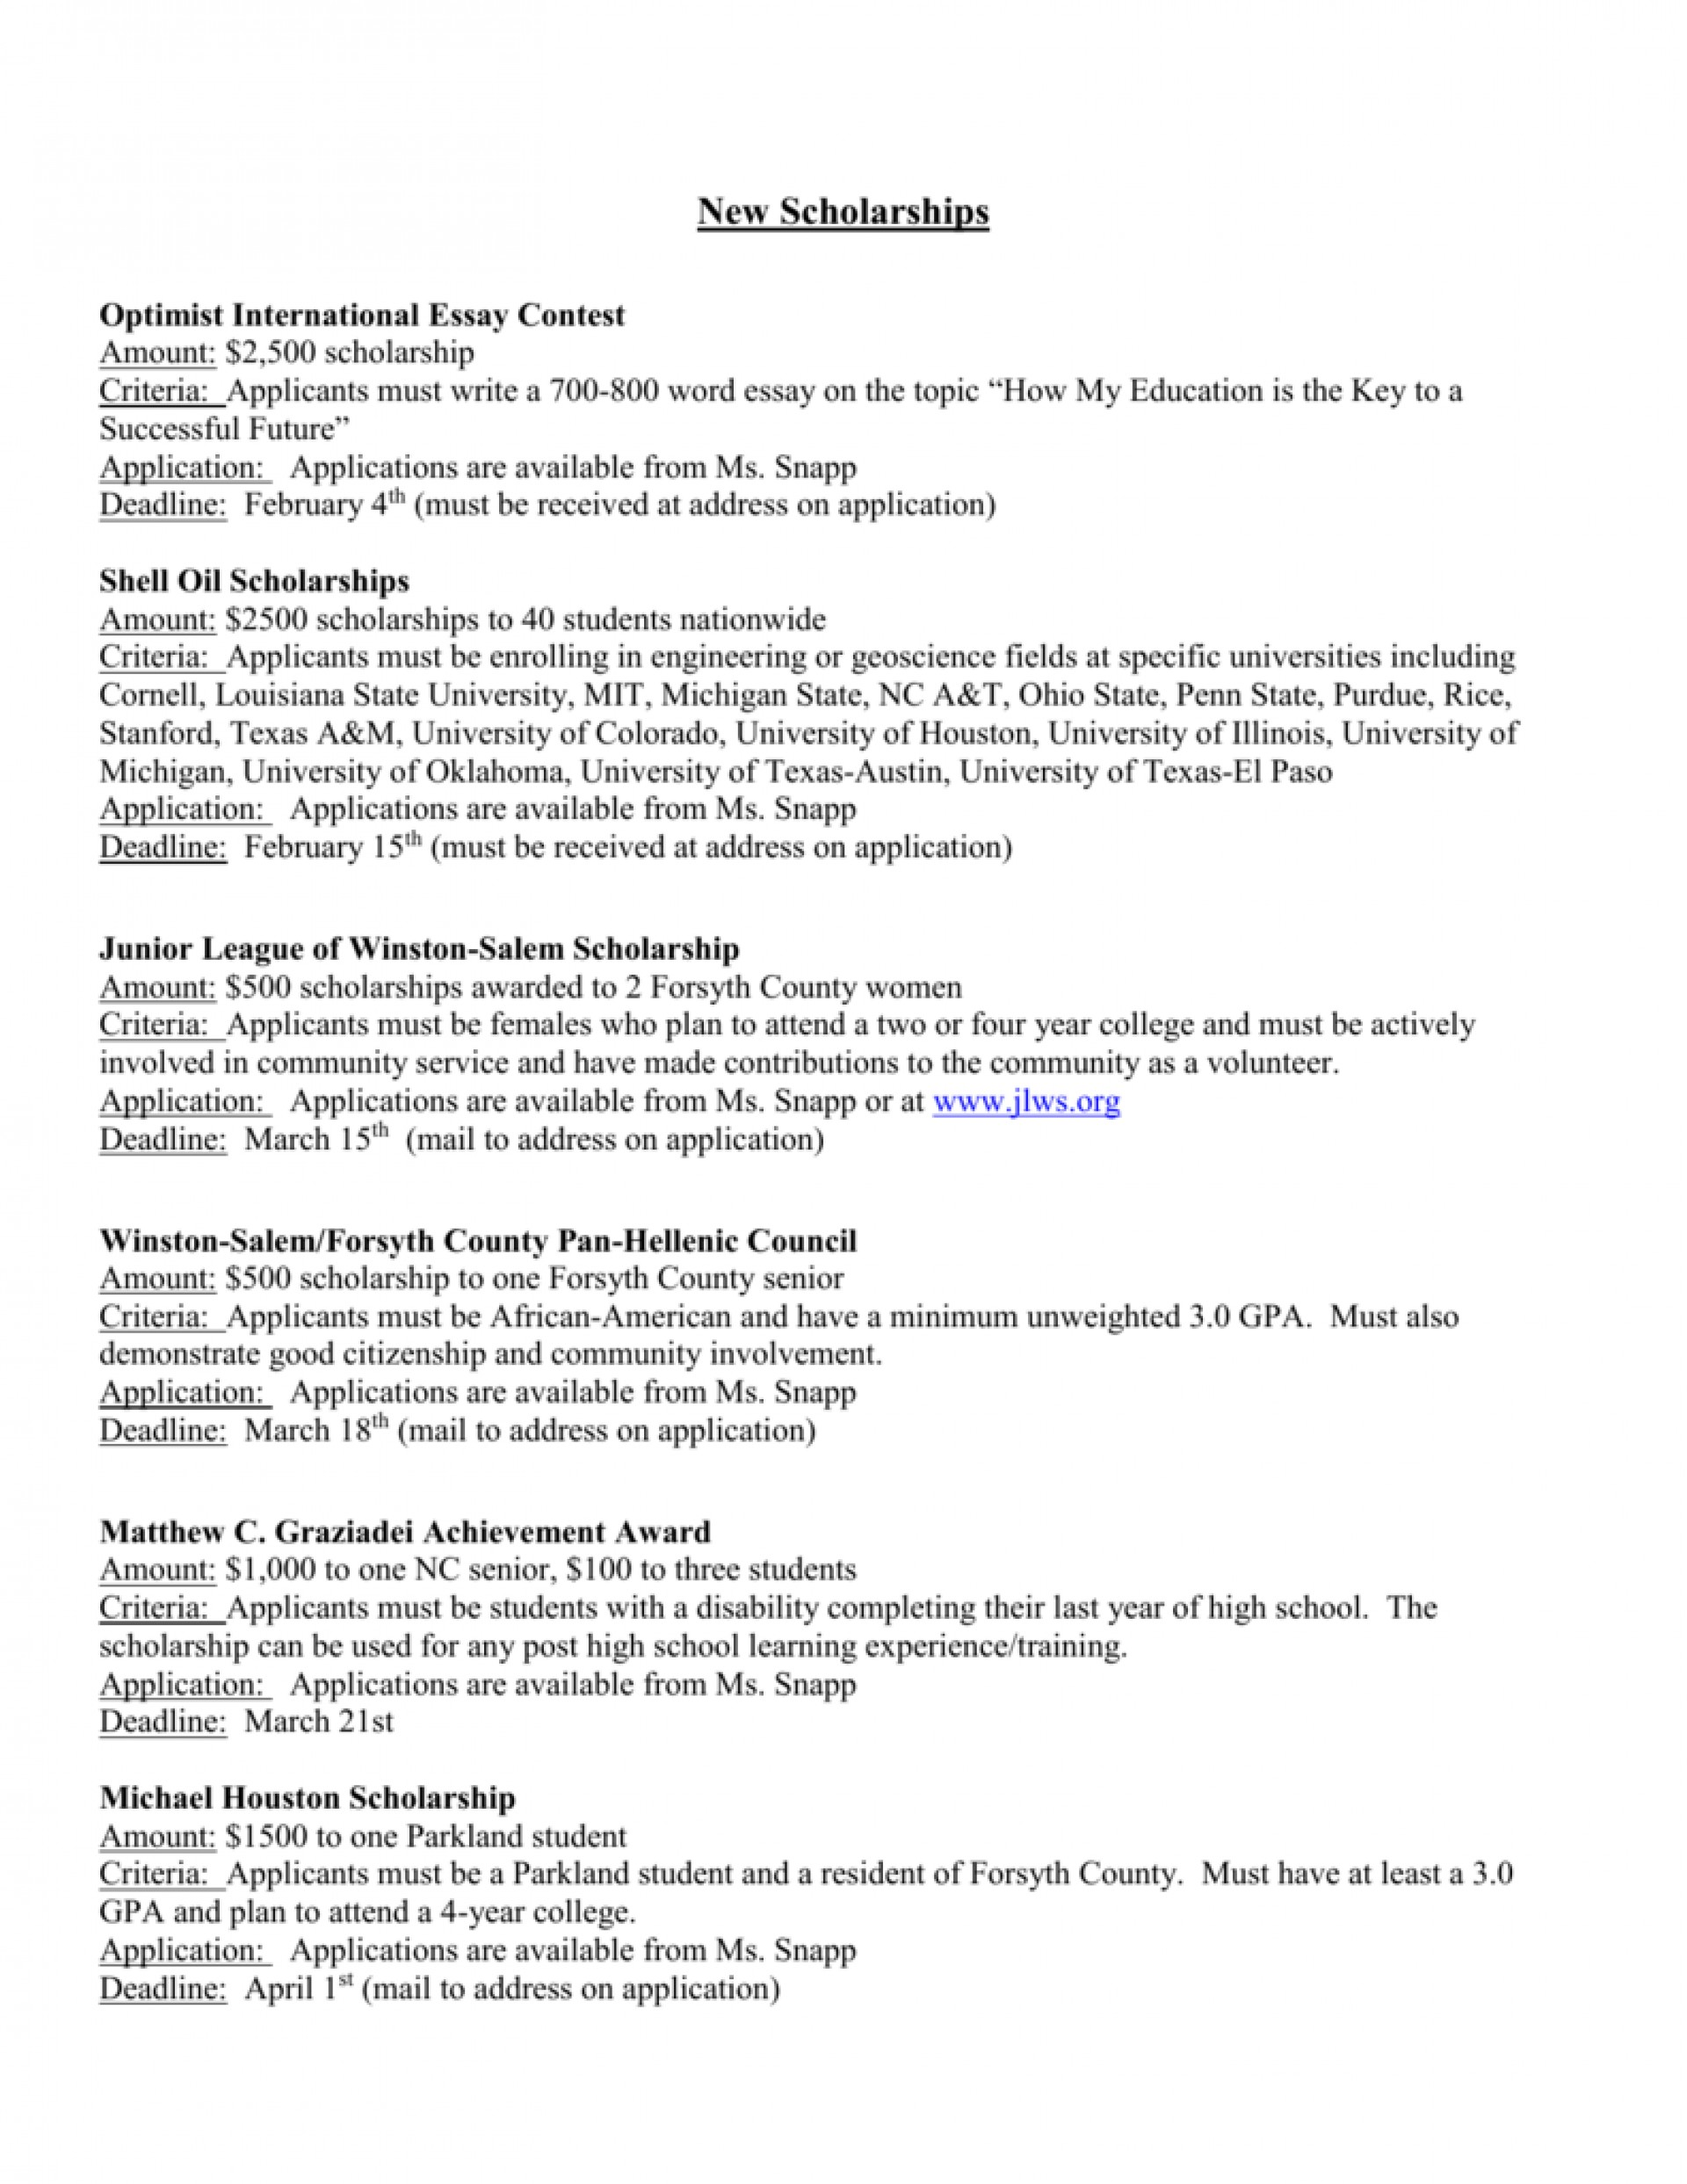 001 Essay Example Immigration Scholarship Contest 007246491 1 Fantastic Usattorneys.com Us Attorneys 1920